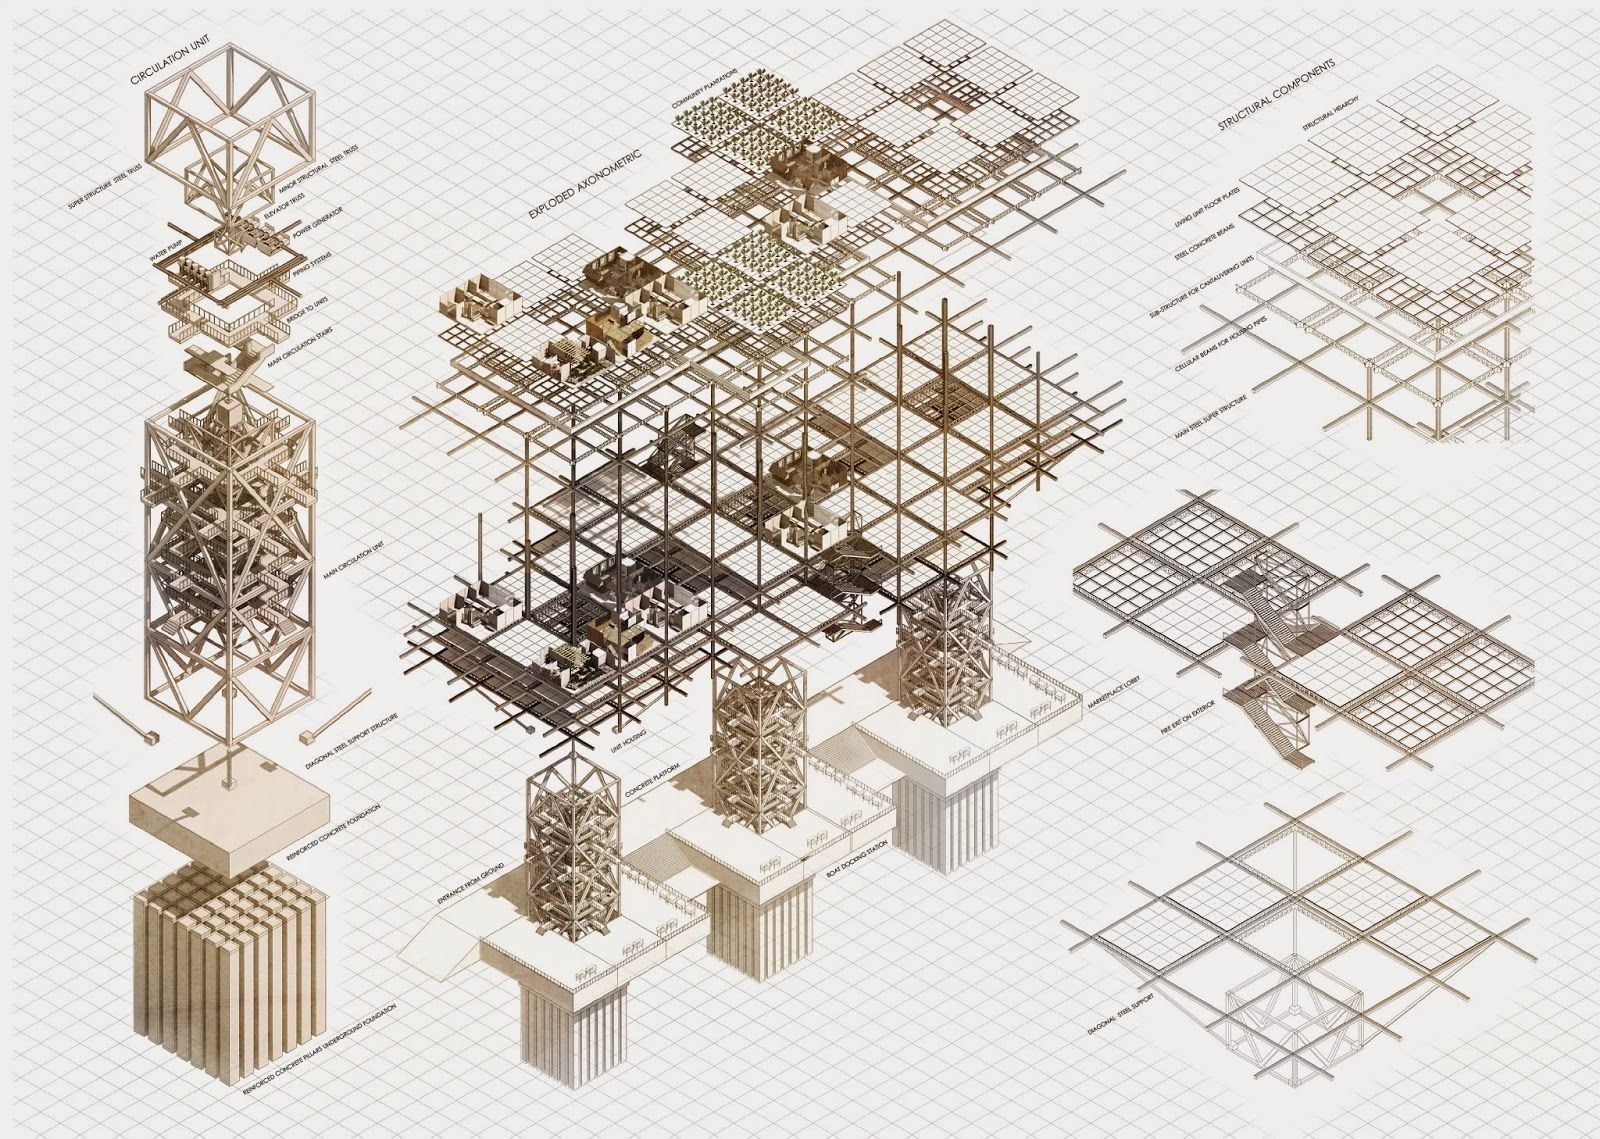 Collective habitat kin project modular housing for Architectural modular homes